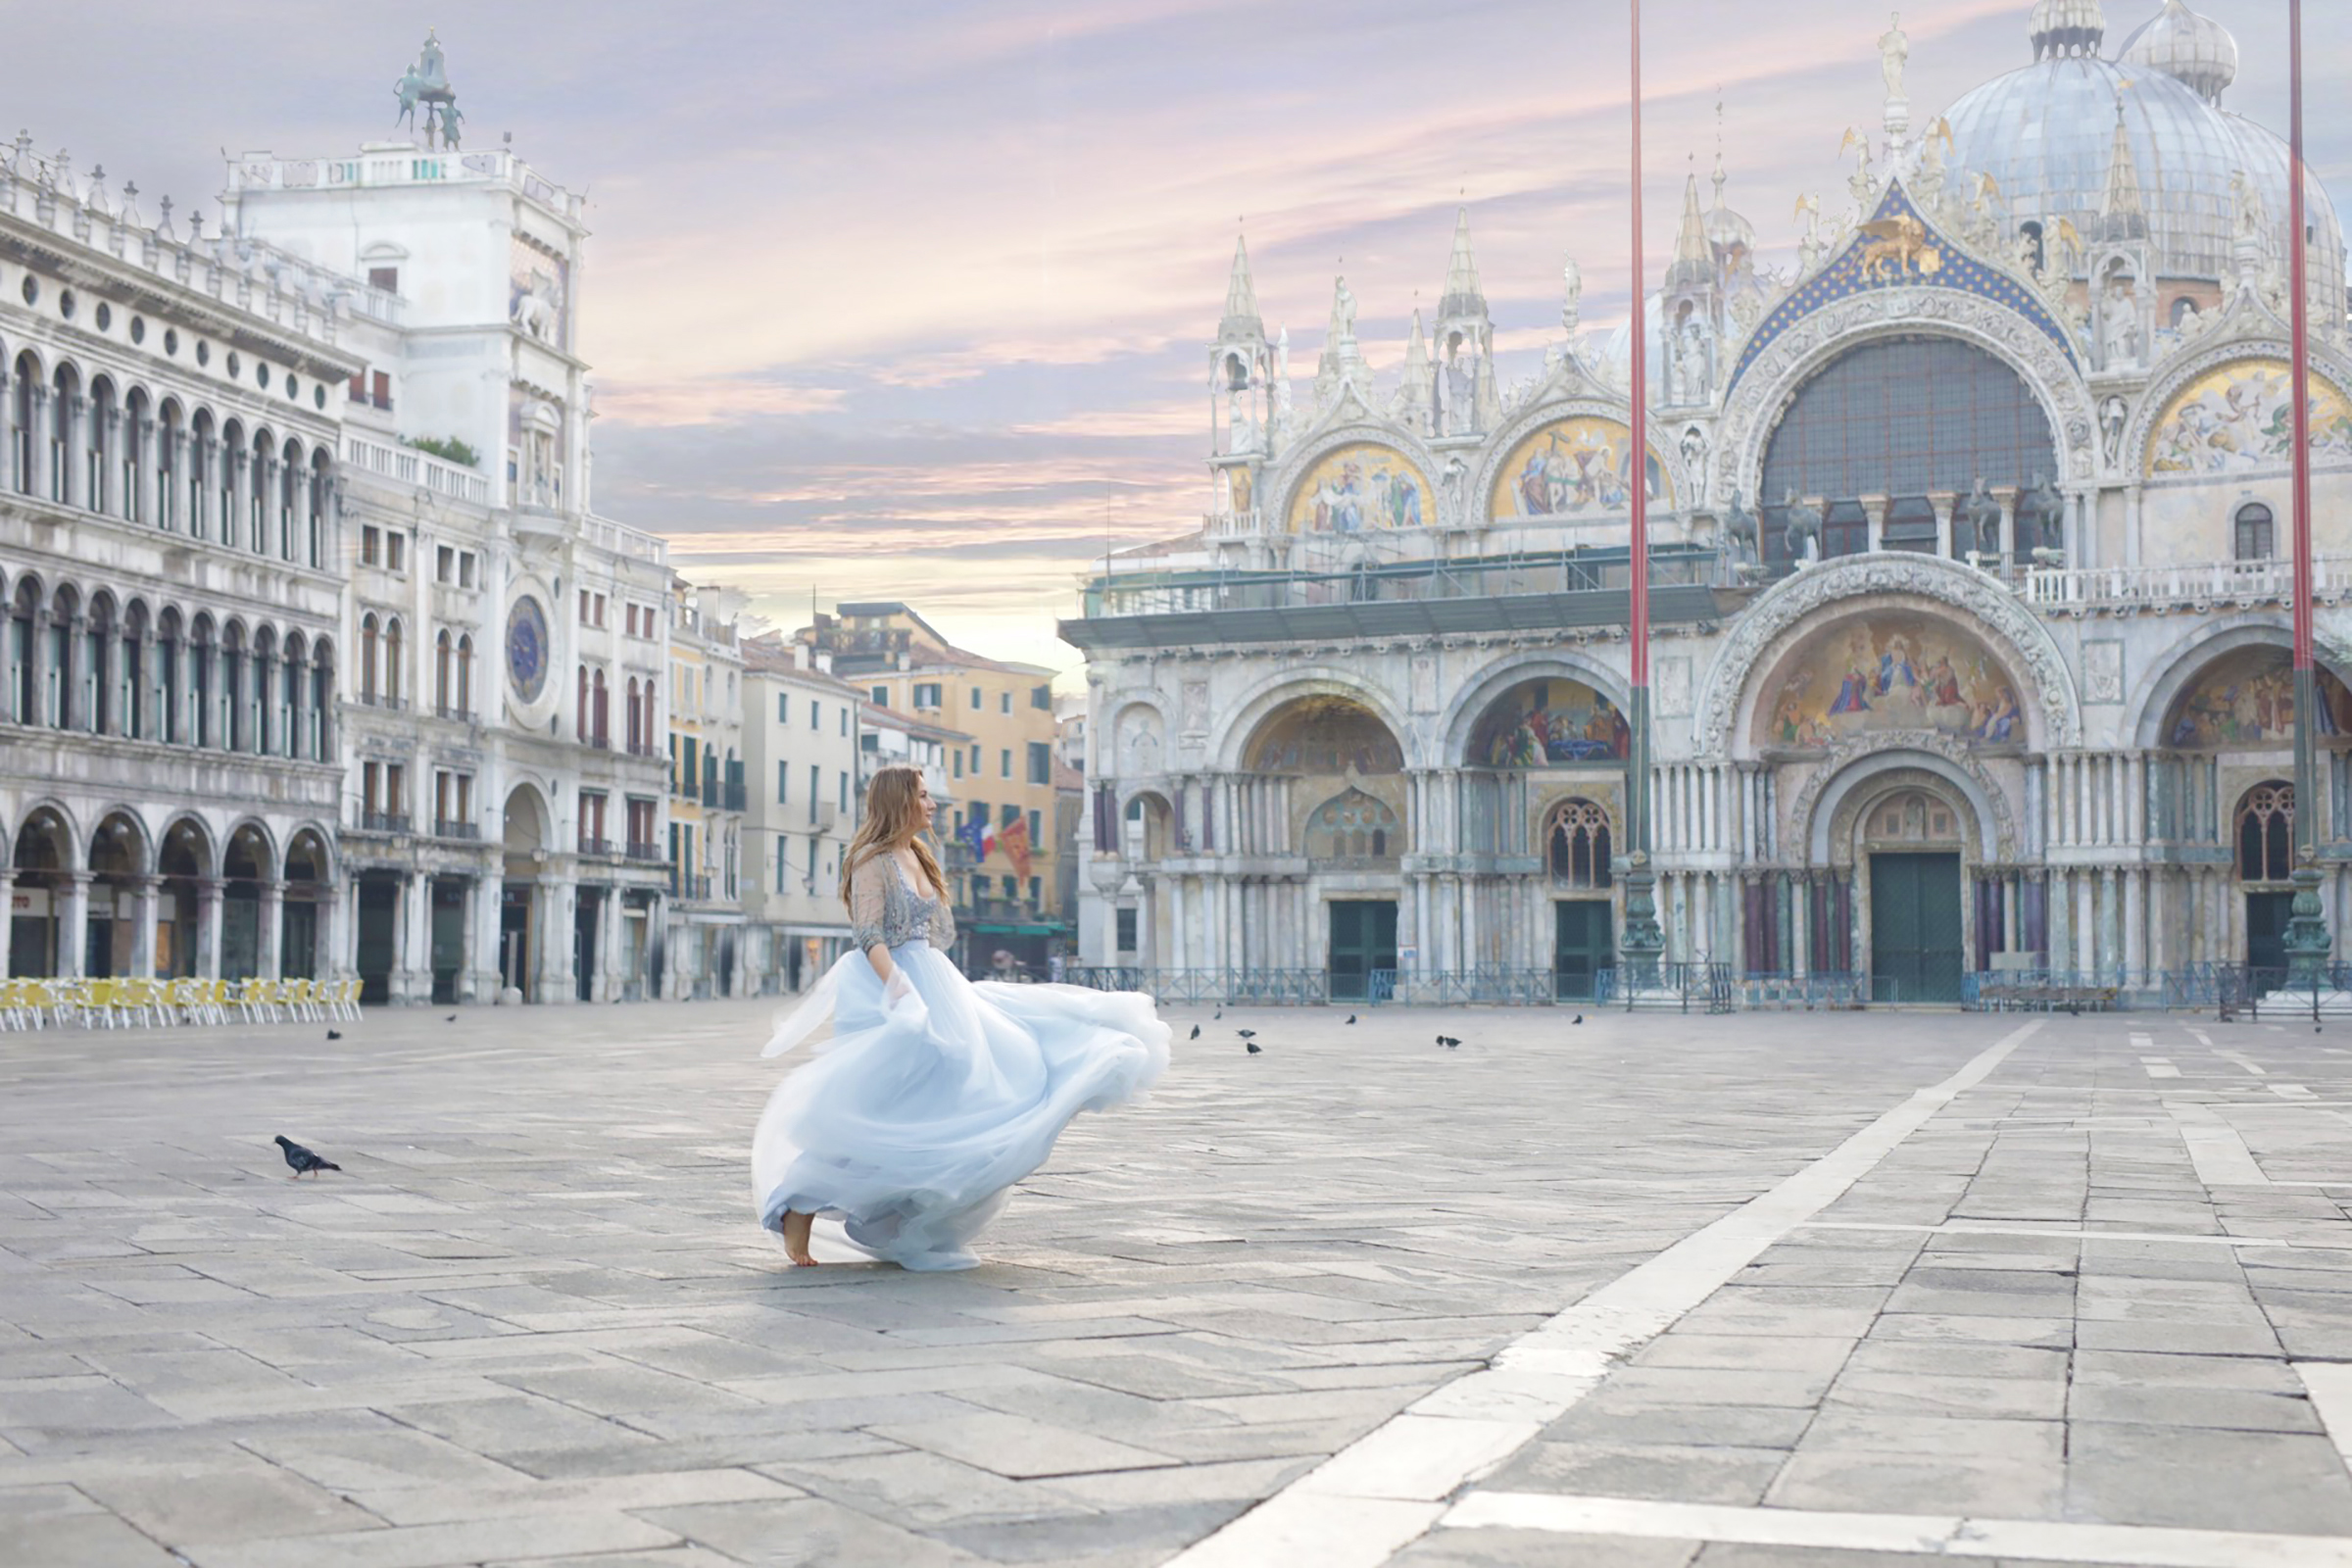 Lenka in San Marco Square, Venice, Italy 2018 at dawn